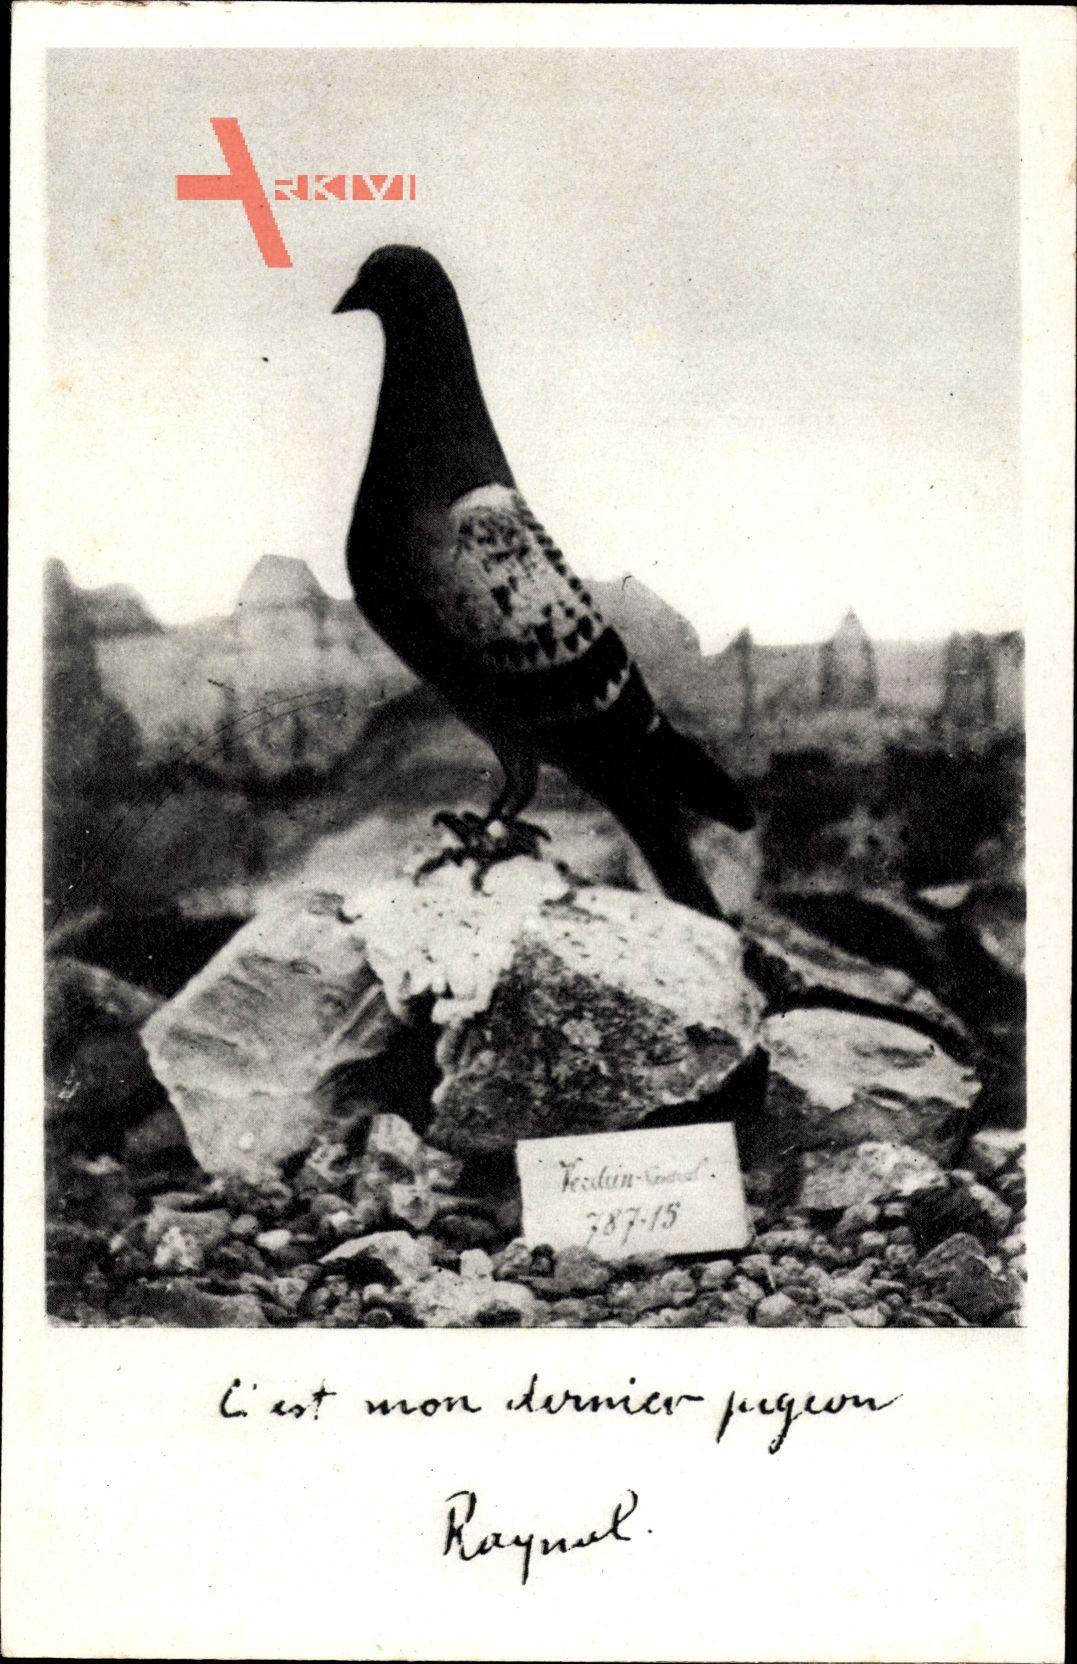 Cest mon dernier pigeon, Verdun, 787 15, 1916, Taube, I. Weltkrieg, Raynal